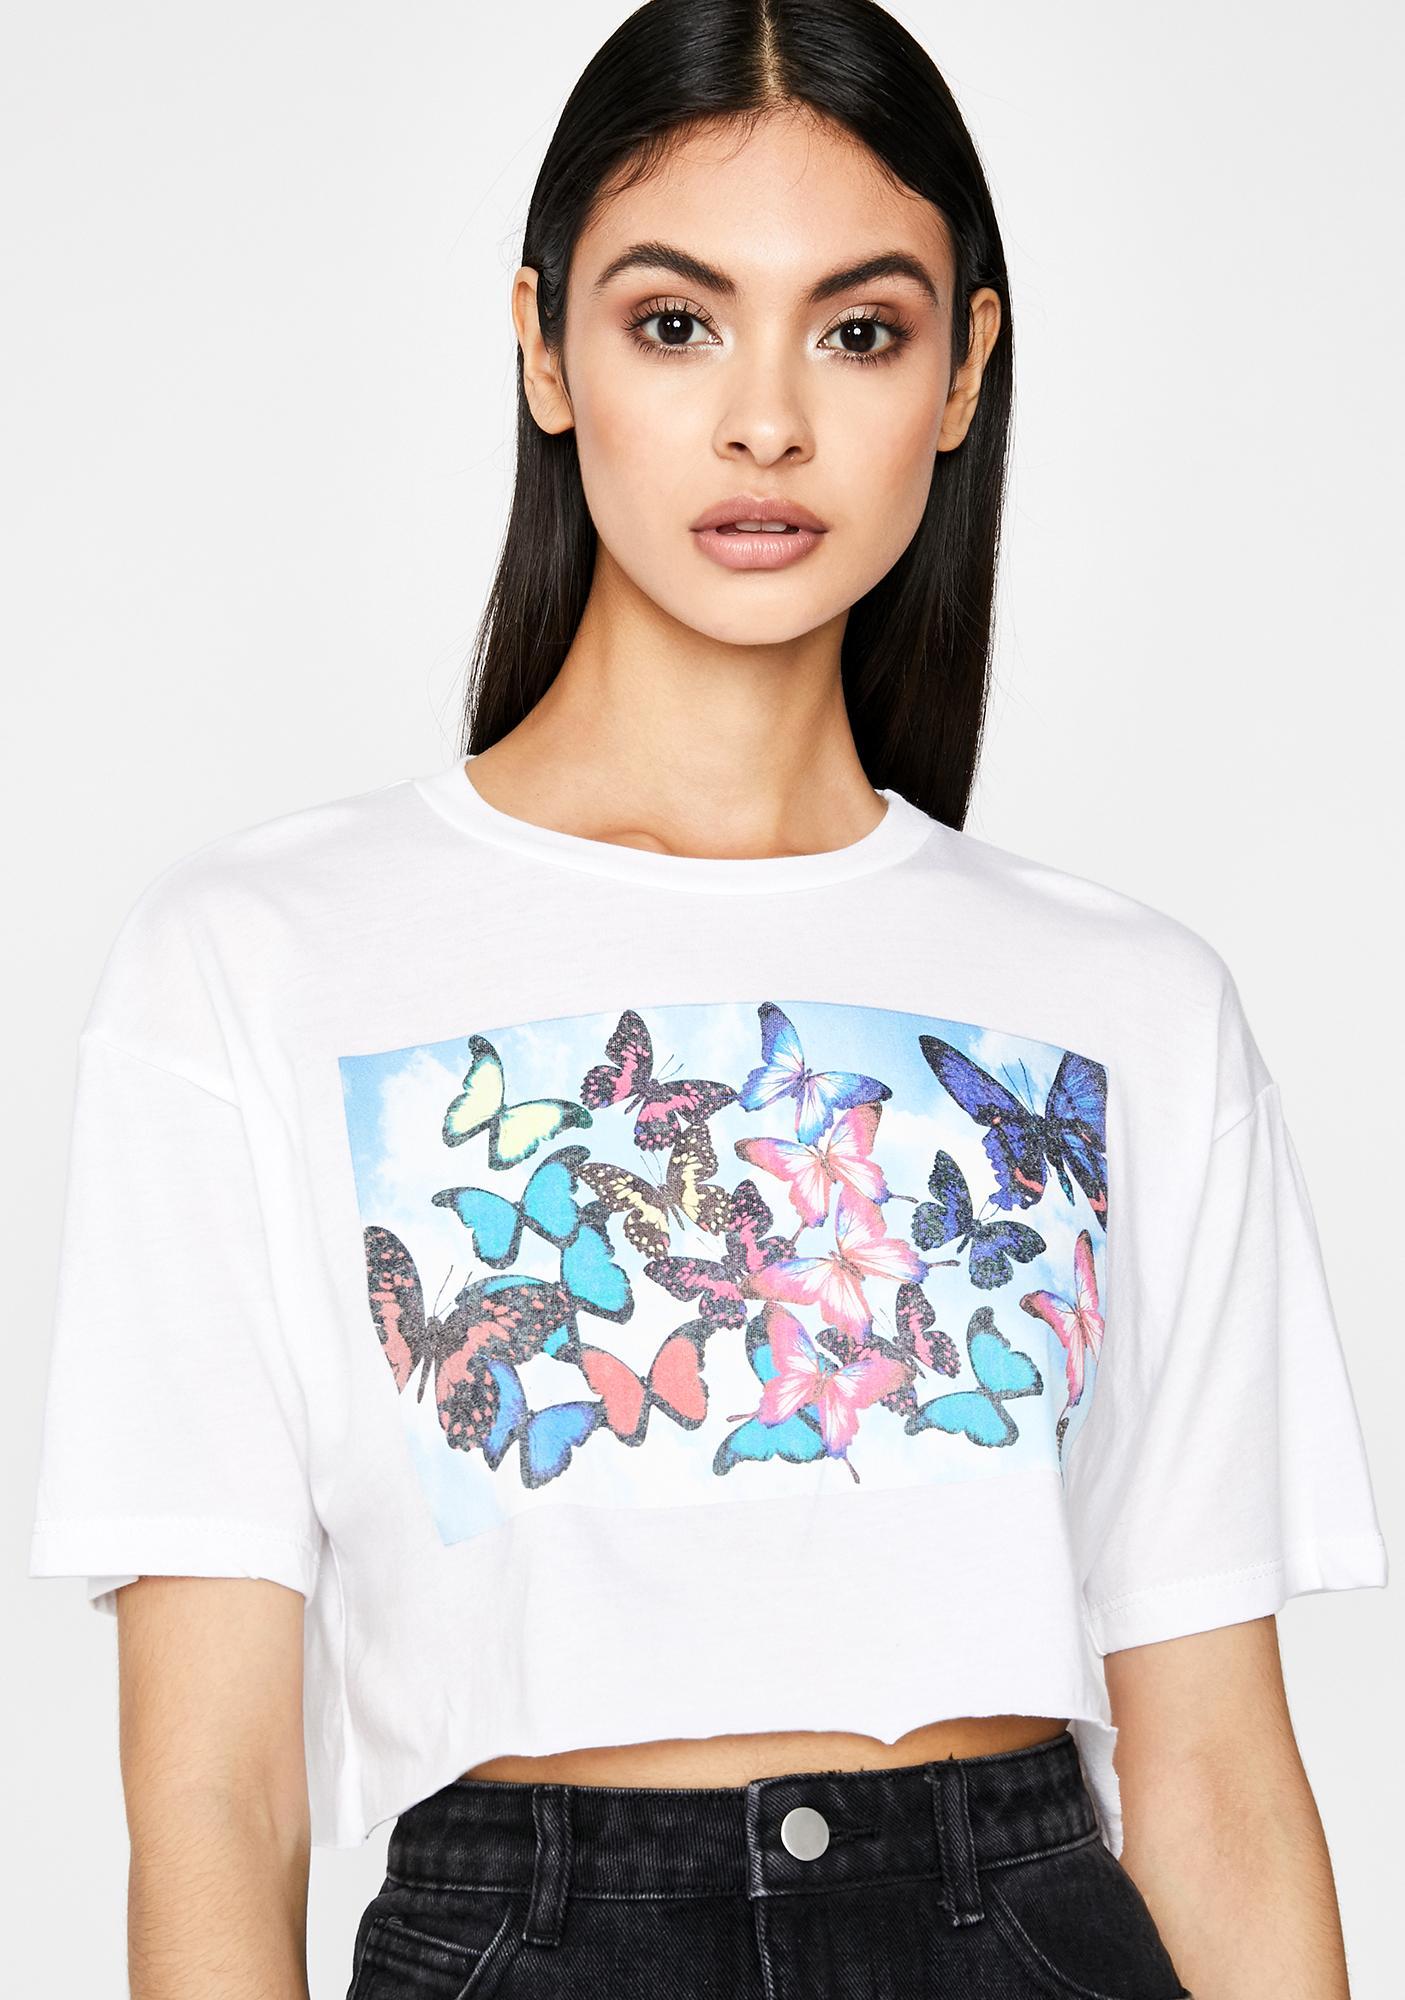 Blissful Butterflies Graphic Tee